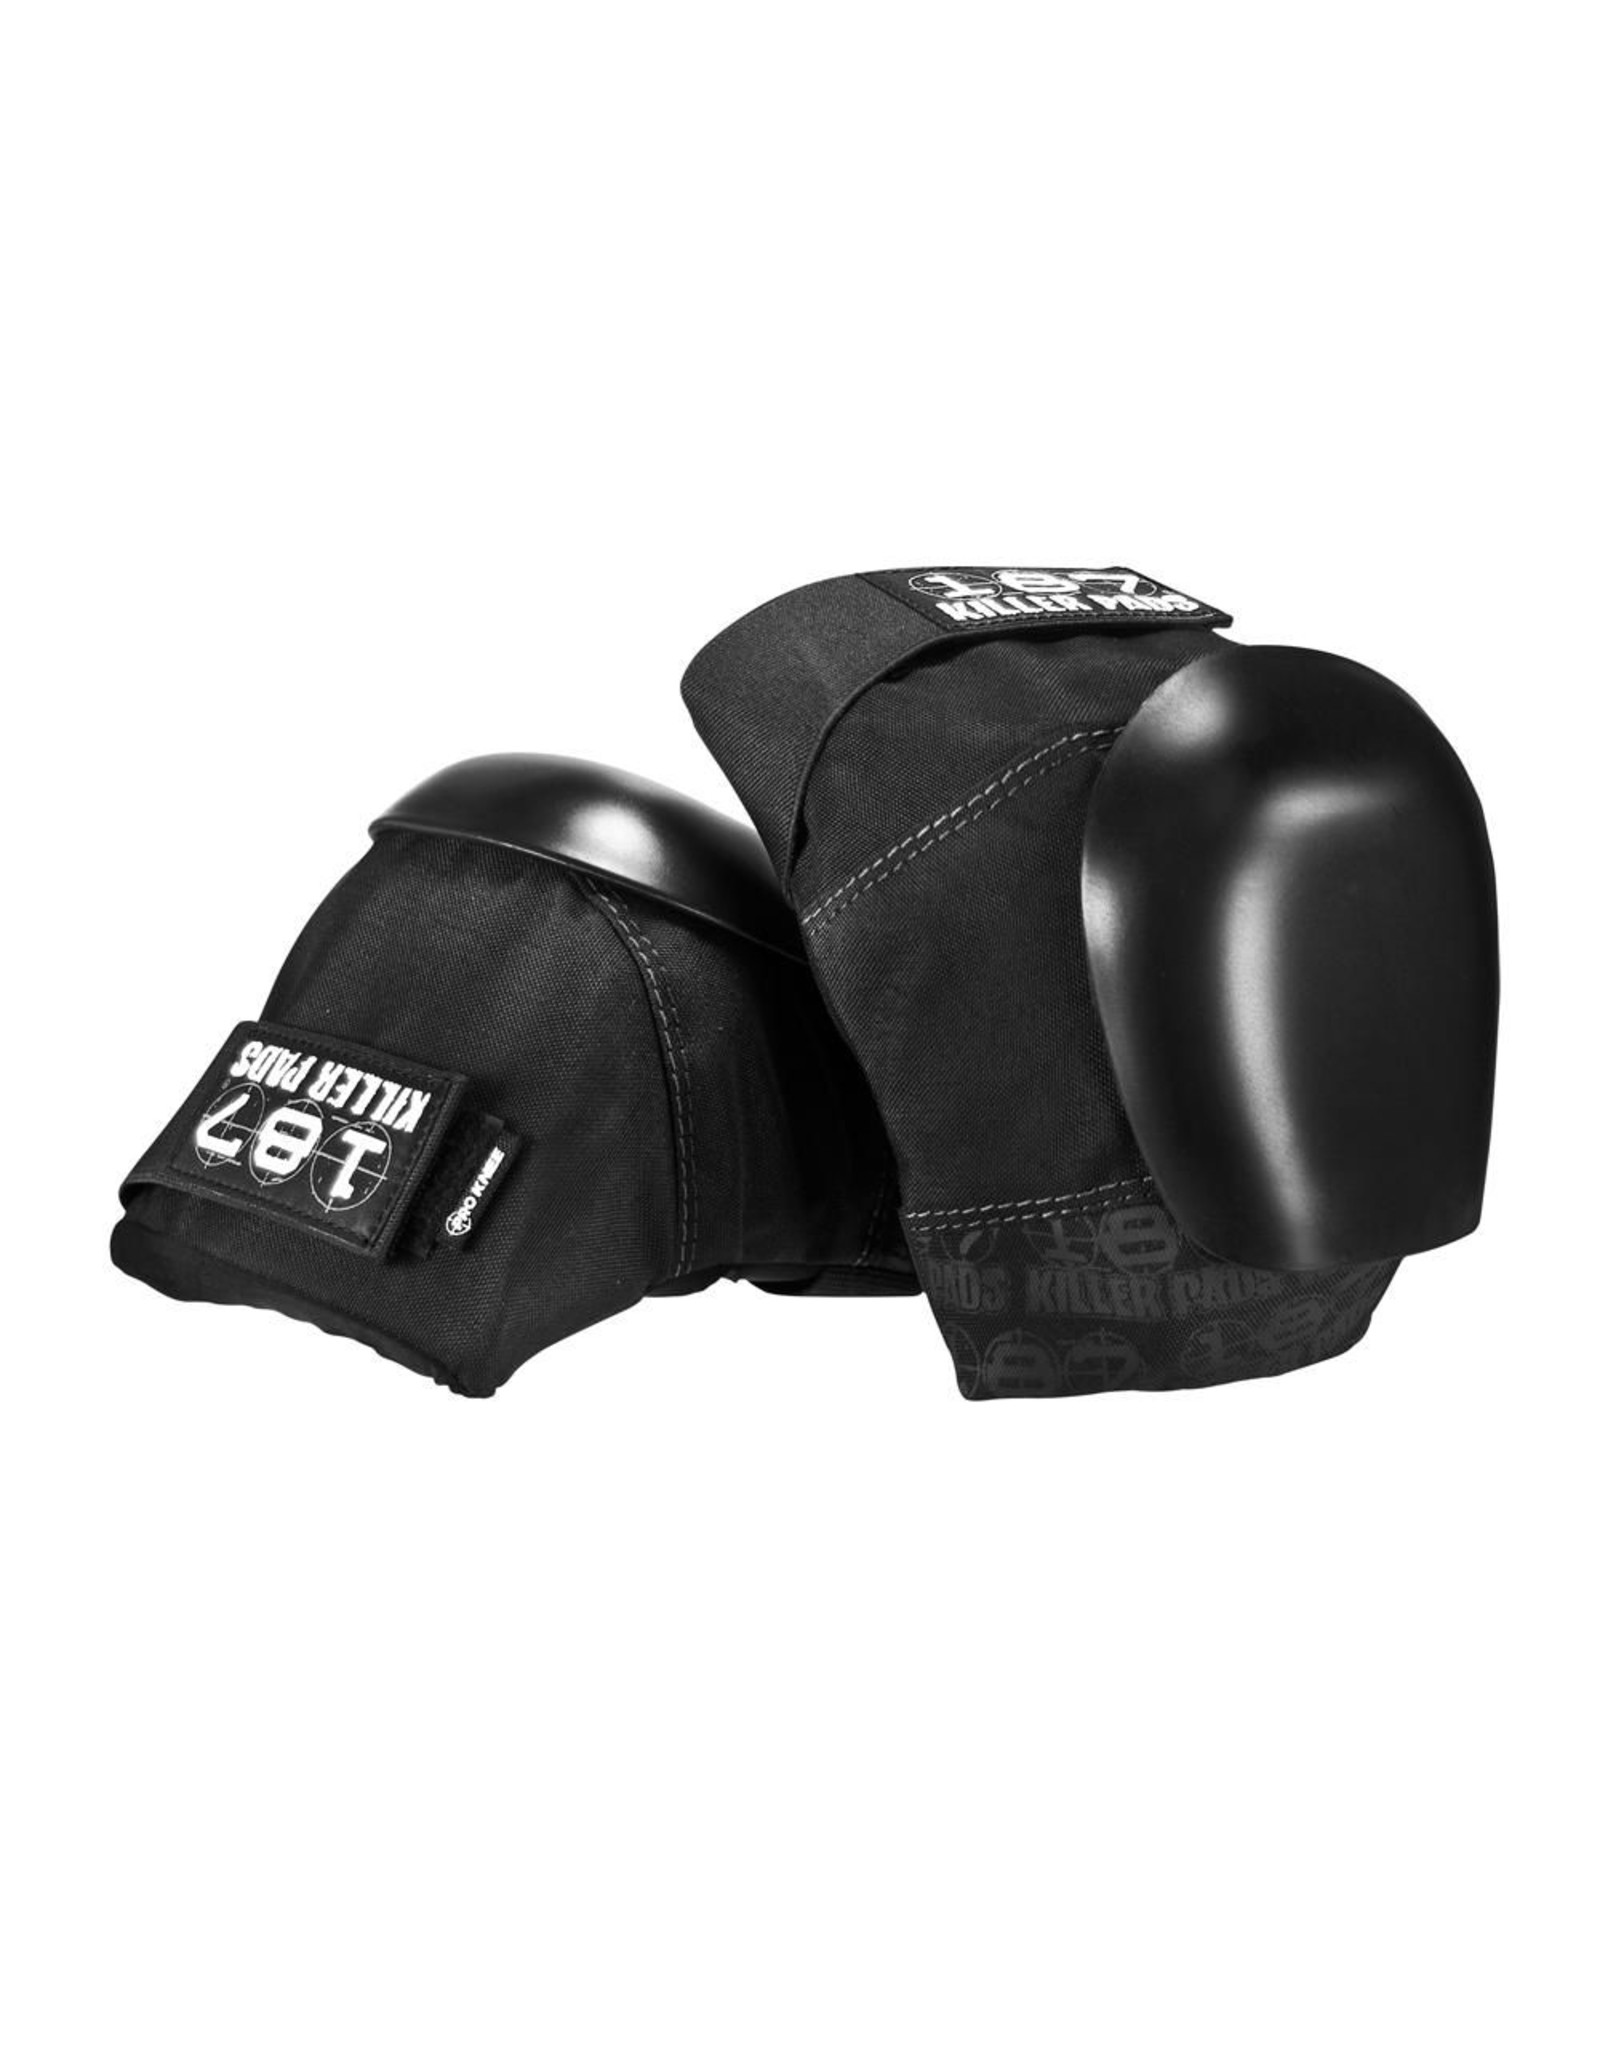 187 187 - Killer Pads Pro Knee - Black - L